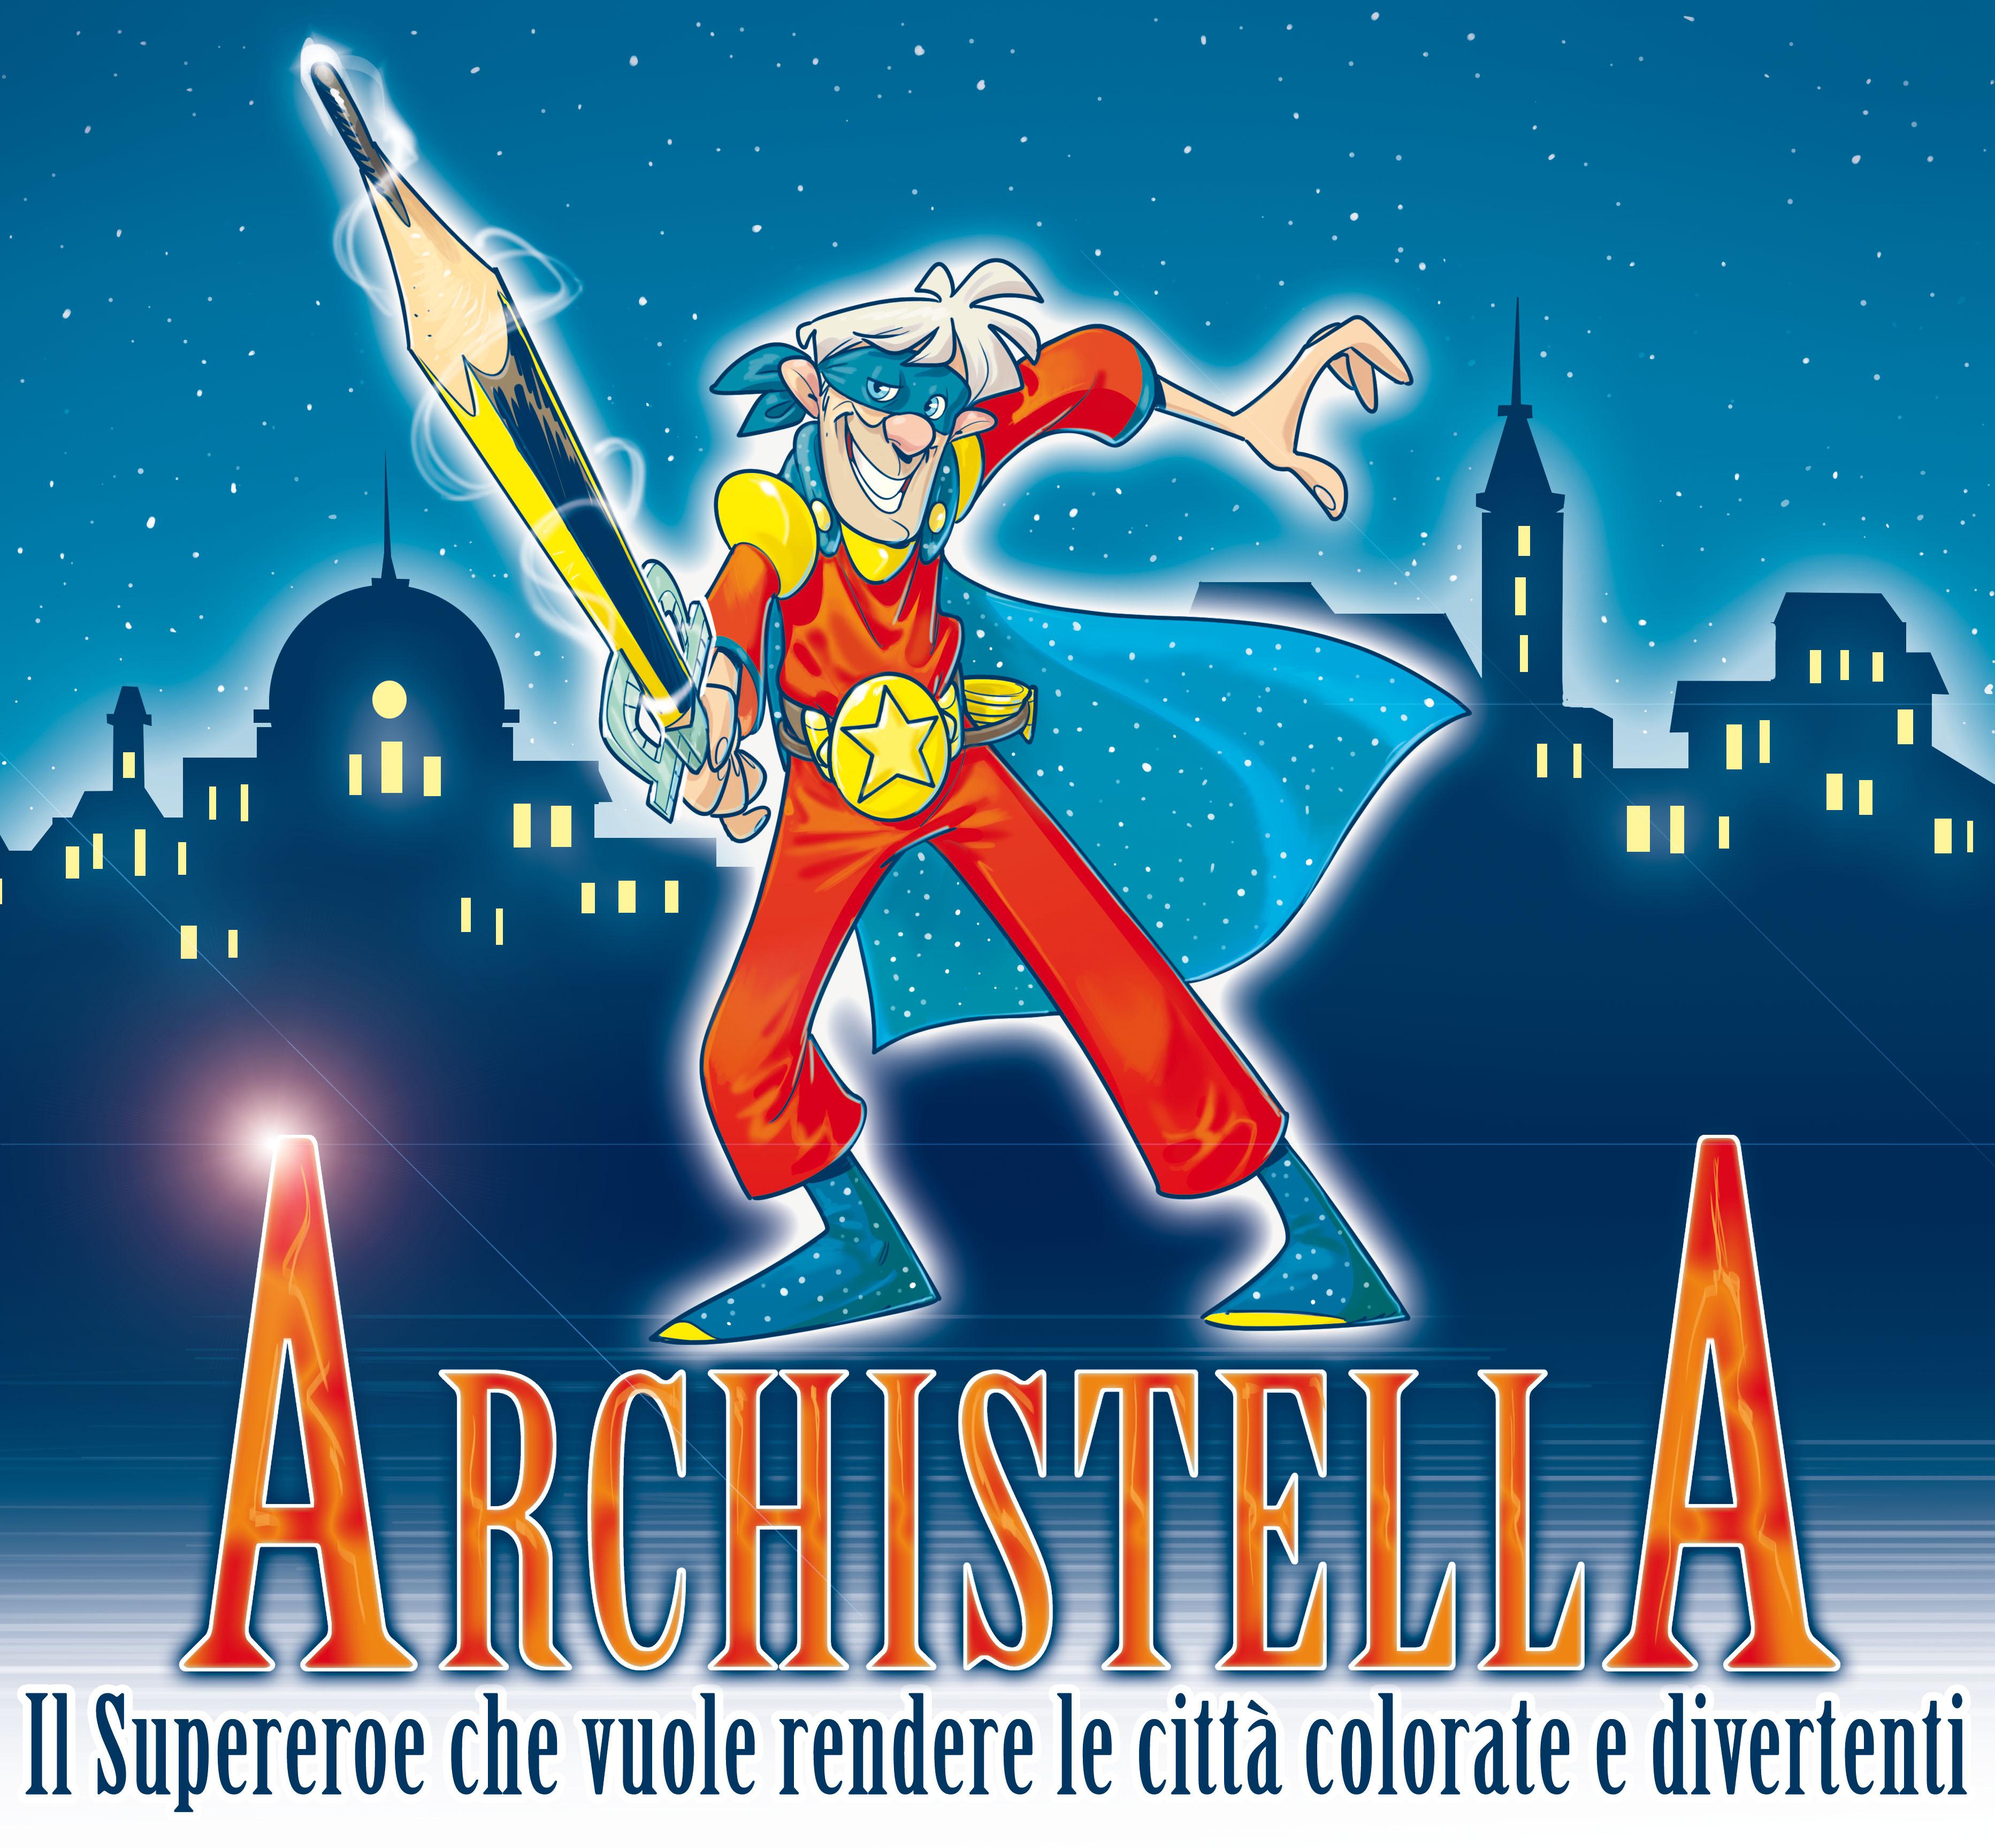 arc-stella-cover